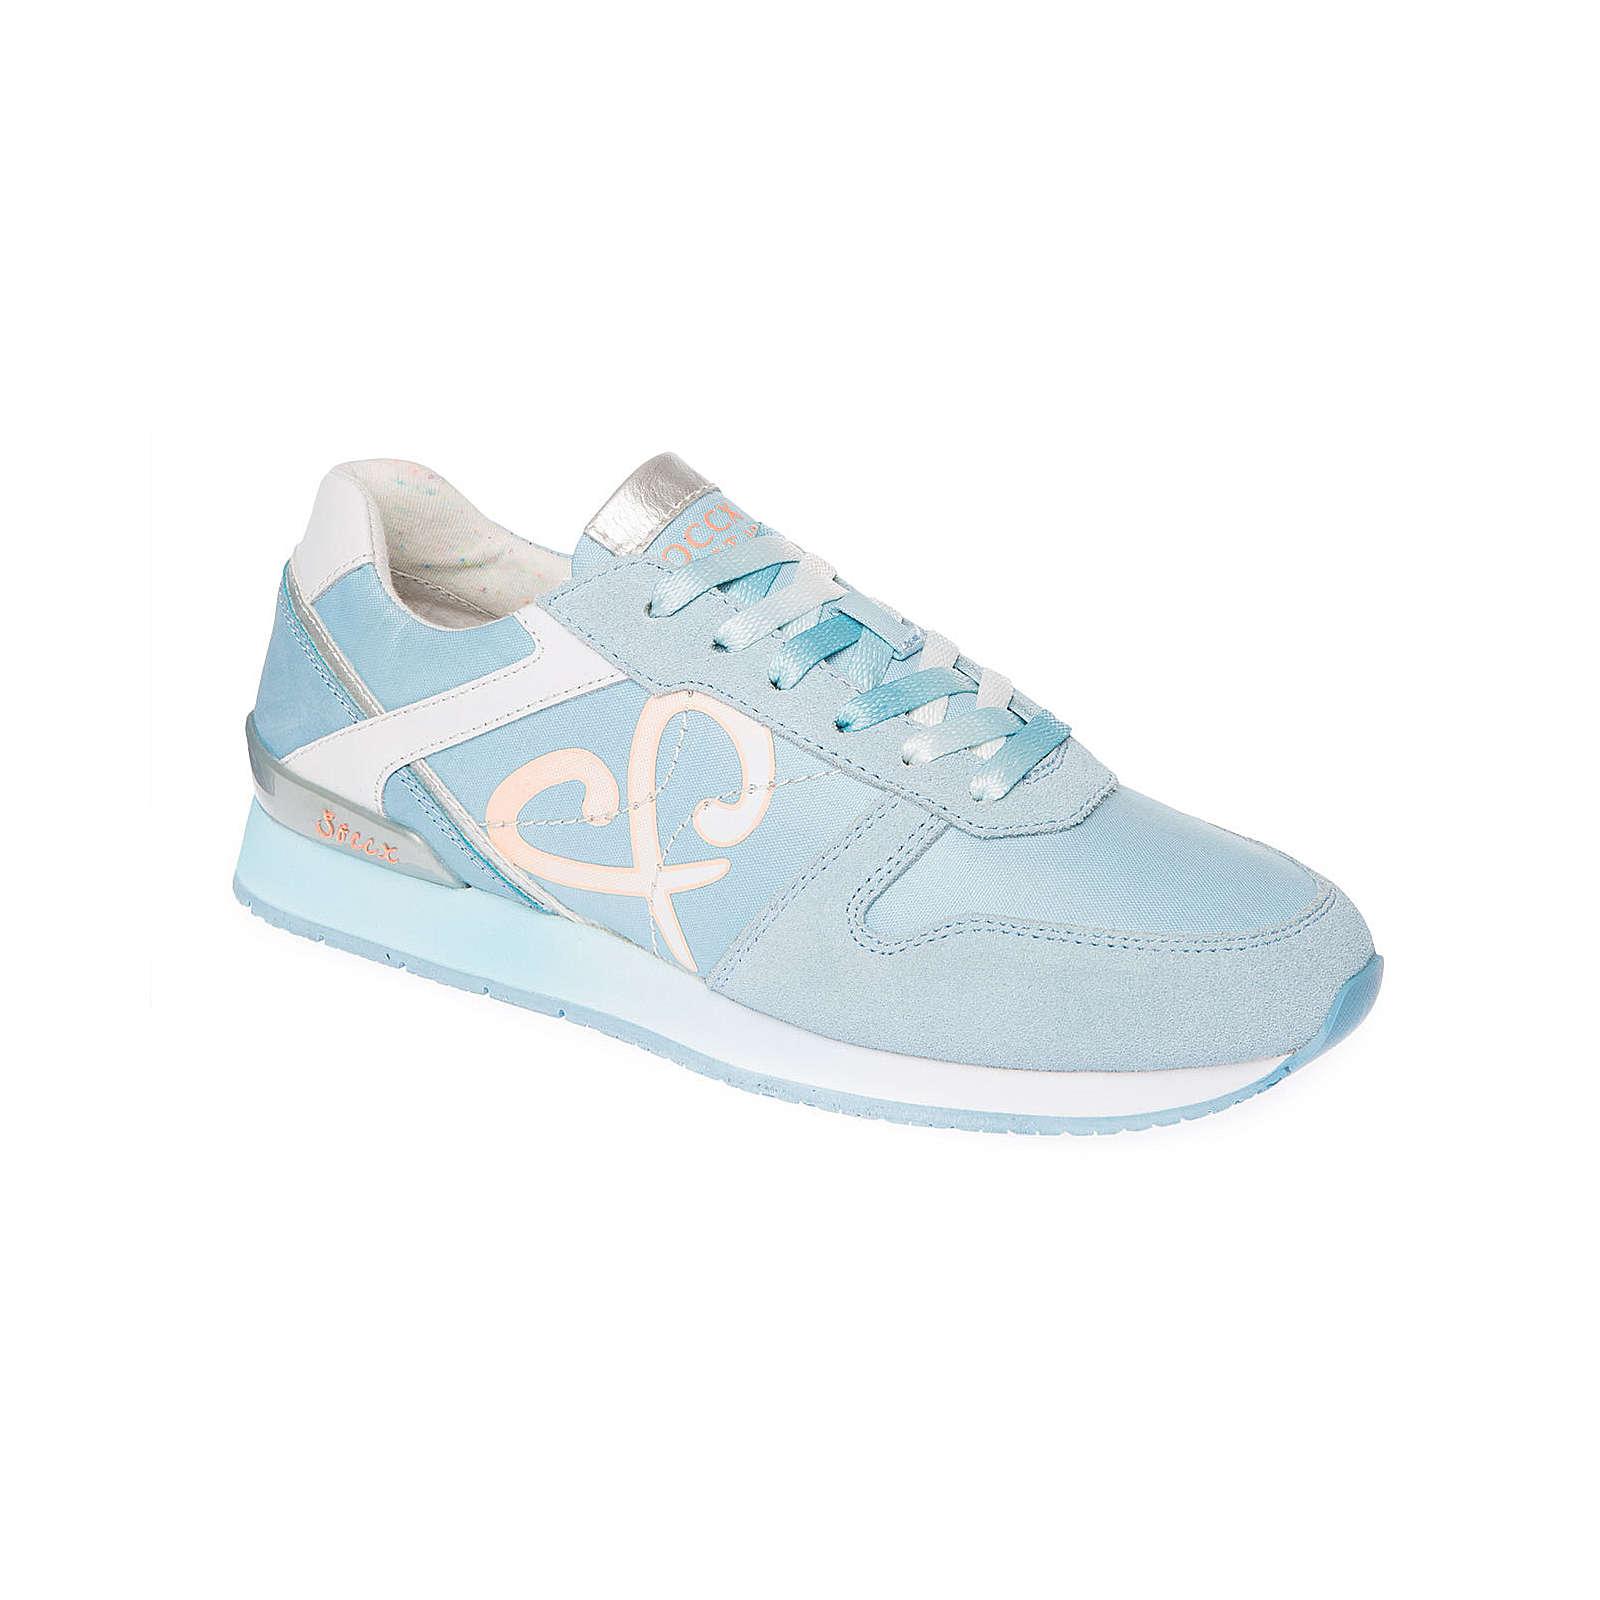 Soccx Sneaker im Materialmix hellblau Damen Gr. 36